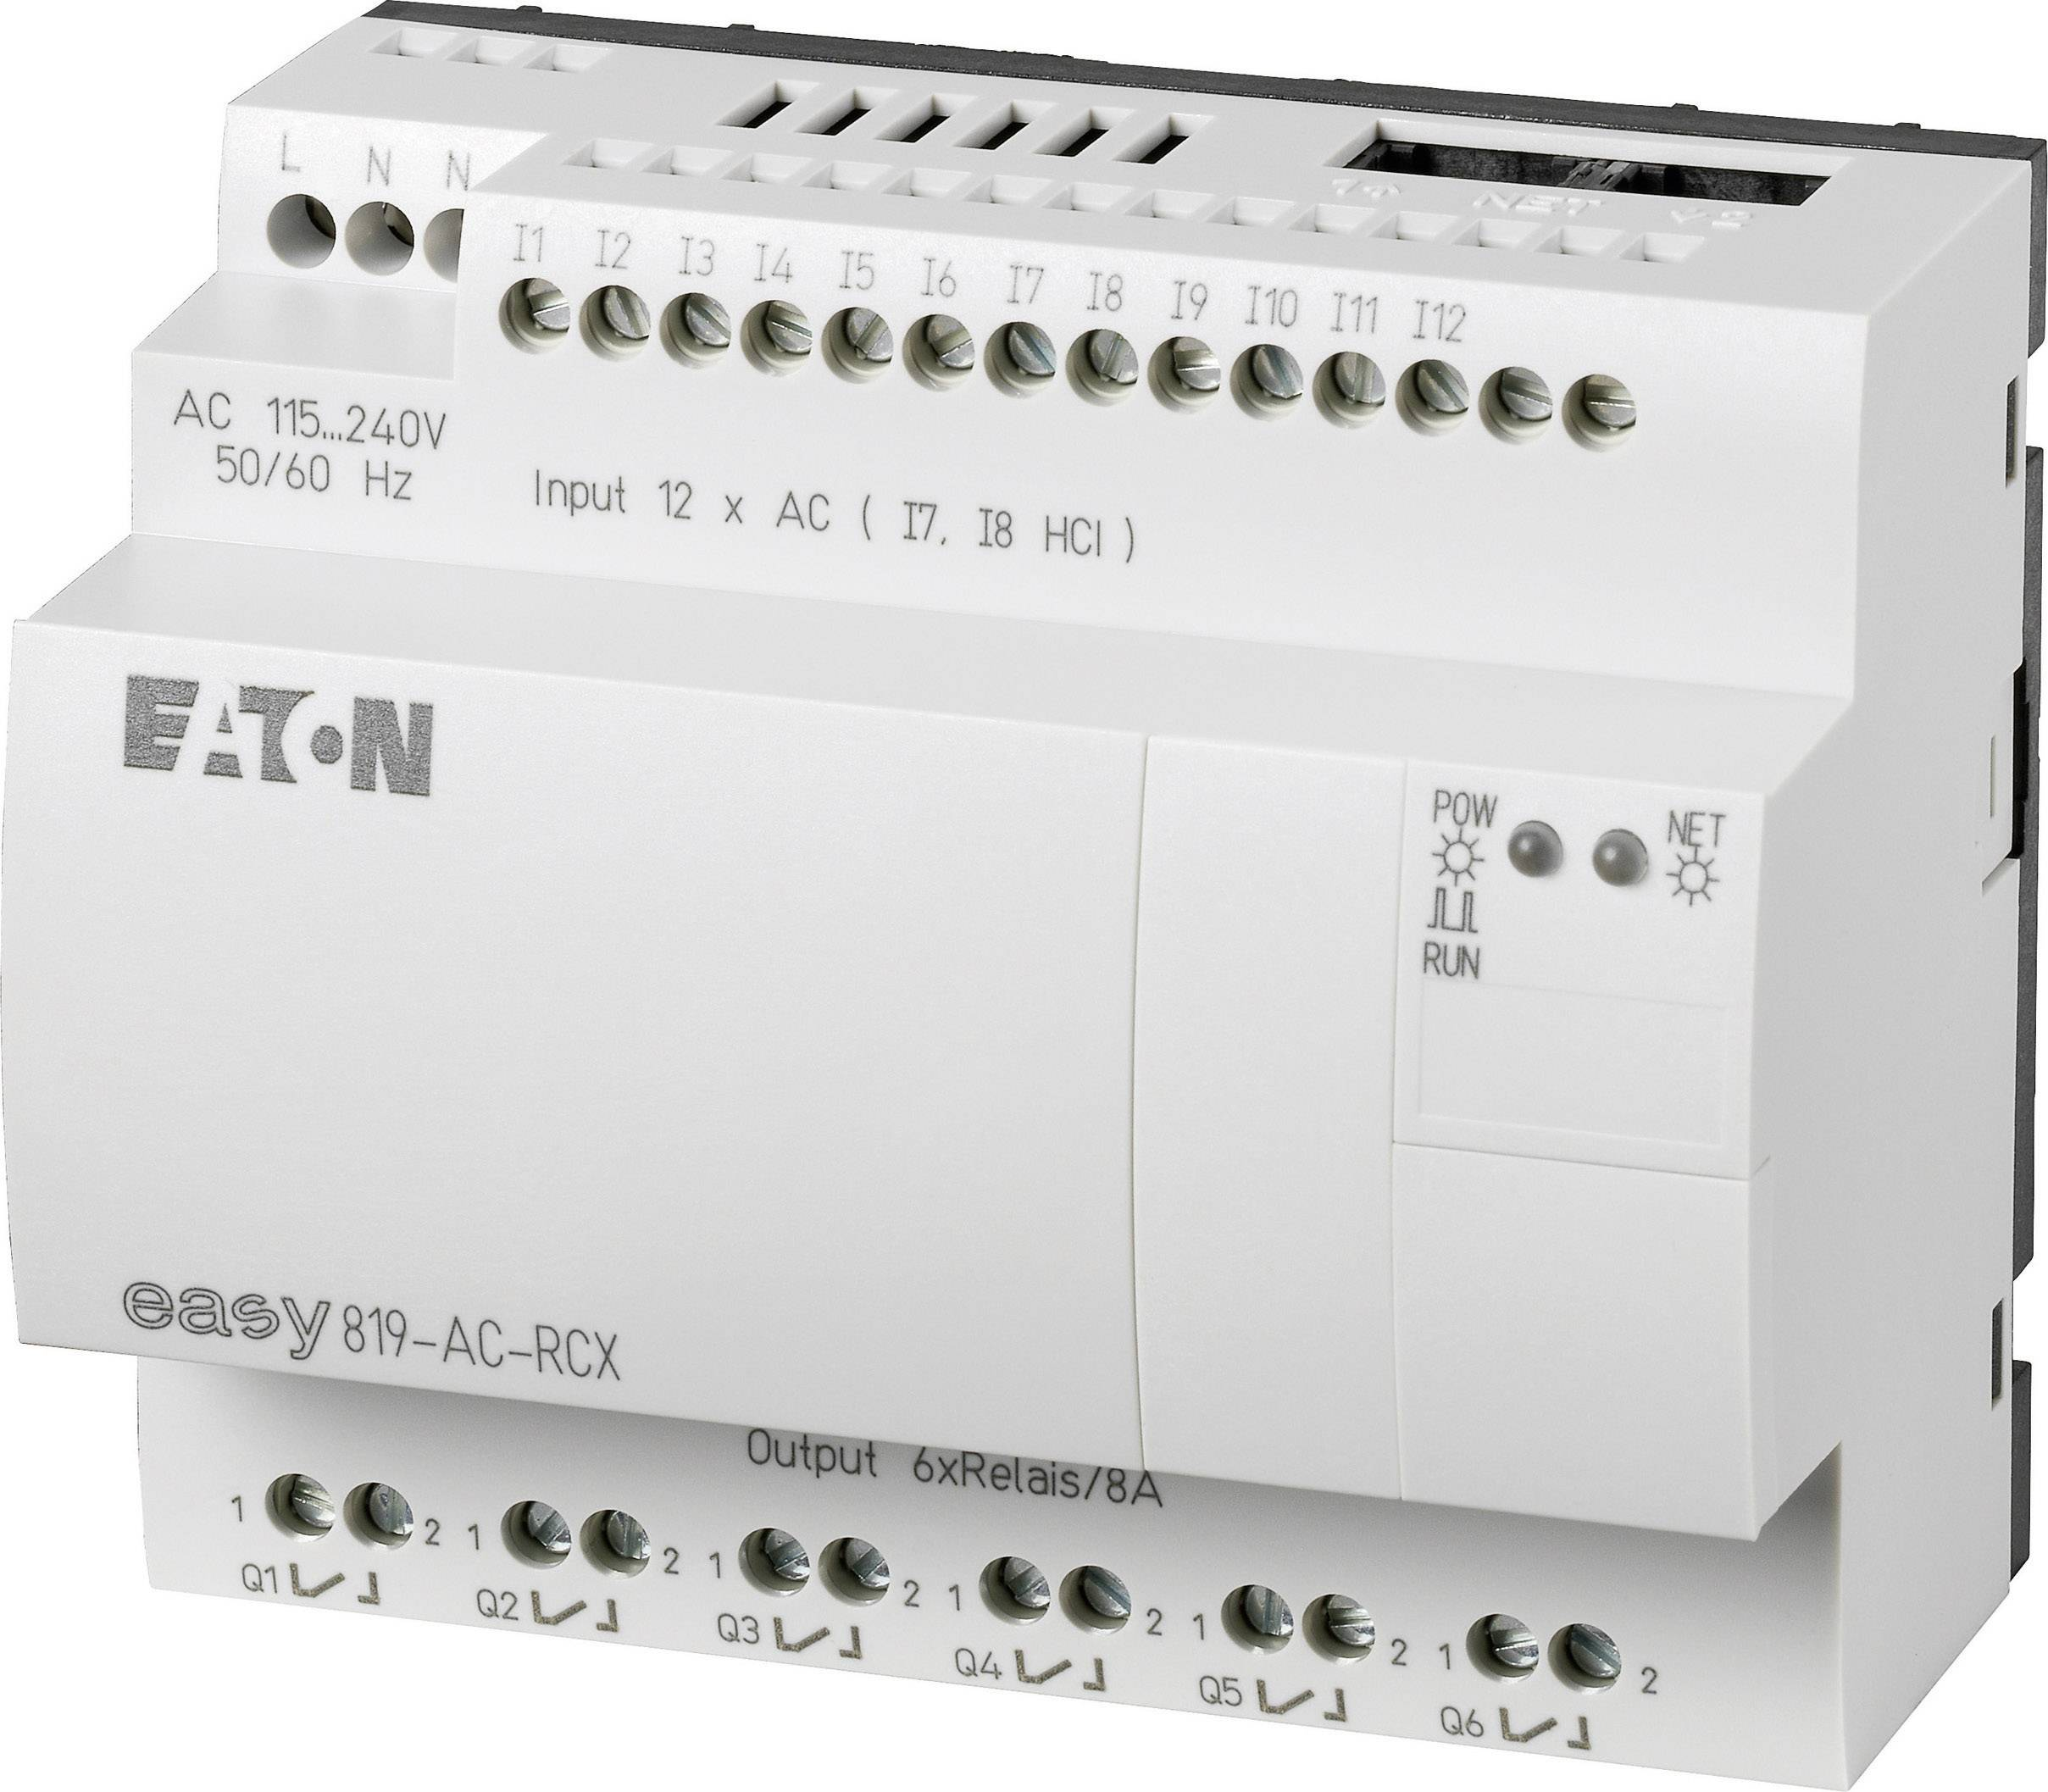 Riadiacimodul Eaton easy 819-AC-RCX 256268, 115 V/AC, 230 V/AC